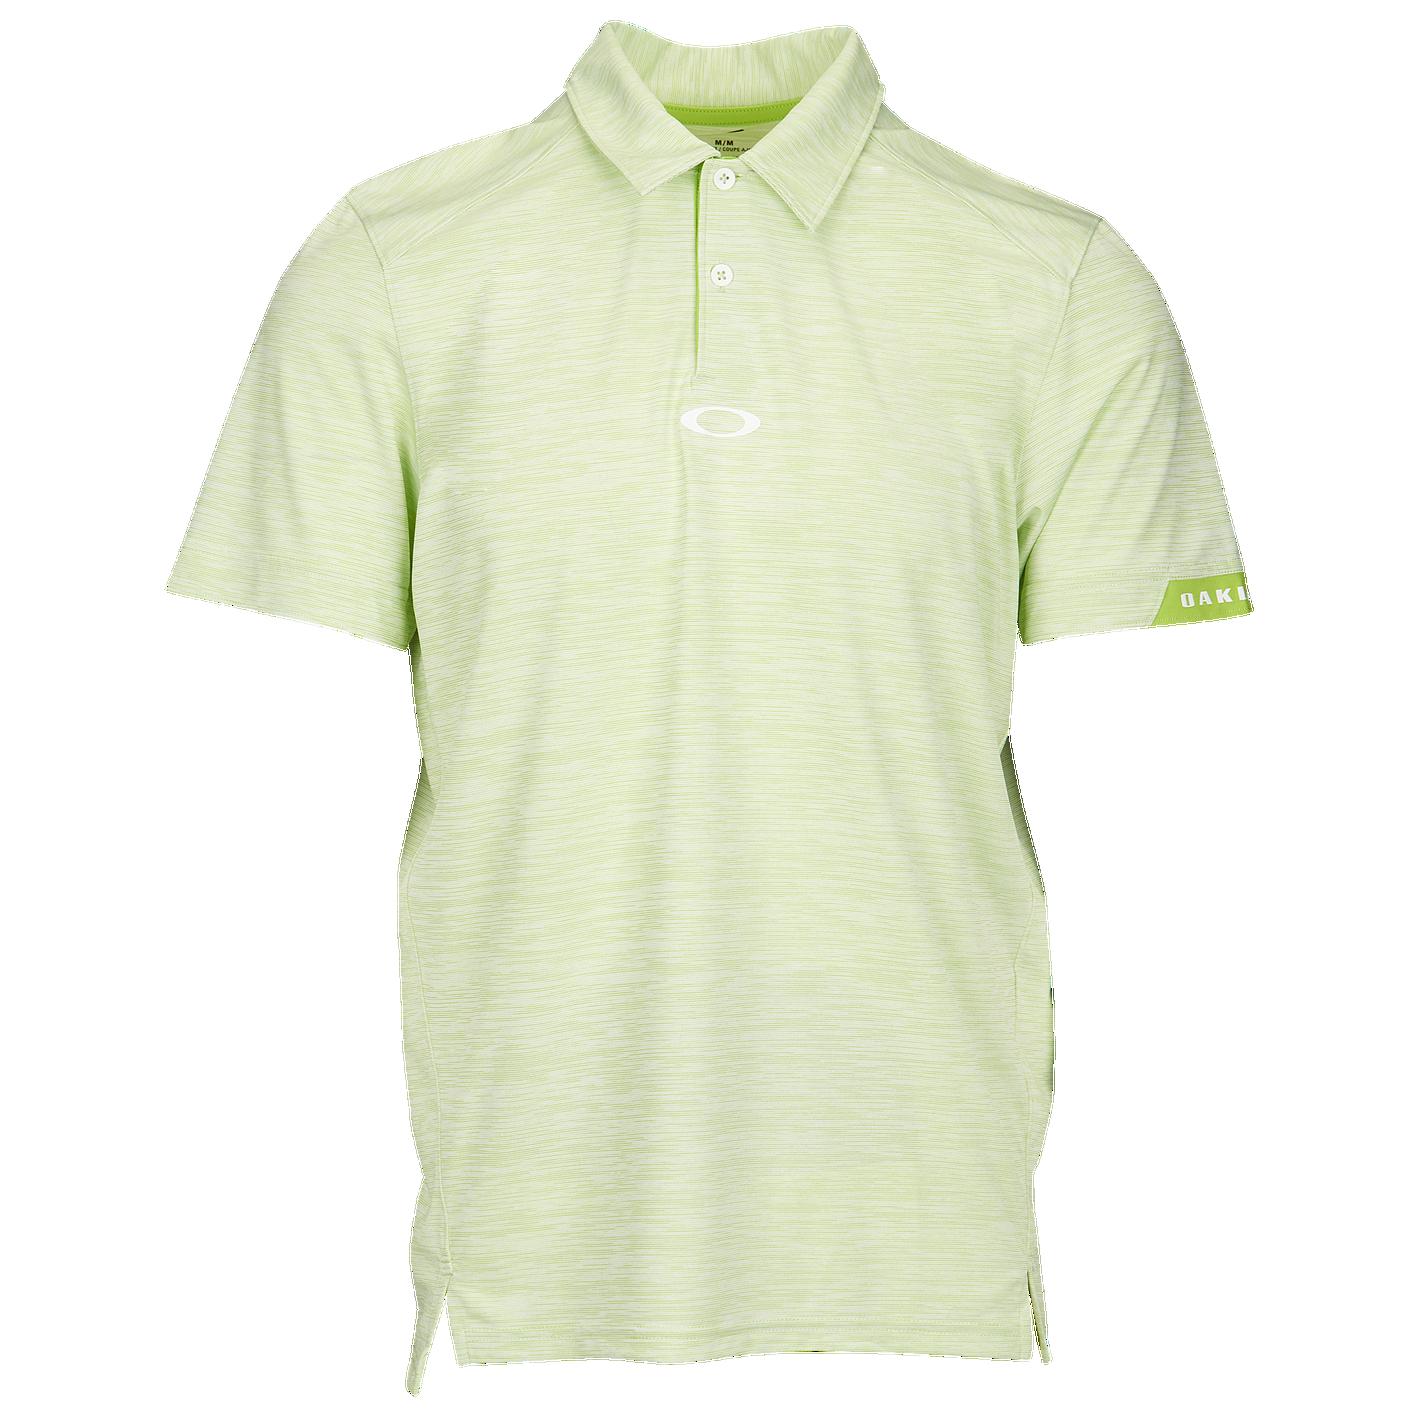 93b90d646a Oakley Gravity Golf Polo 2.0 - Men s - Golf - Clothing - Lime Green